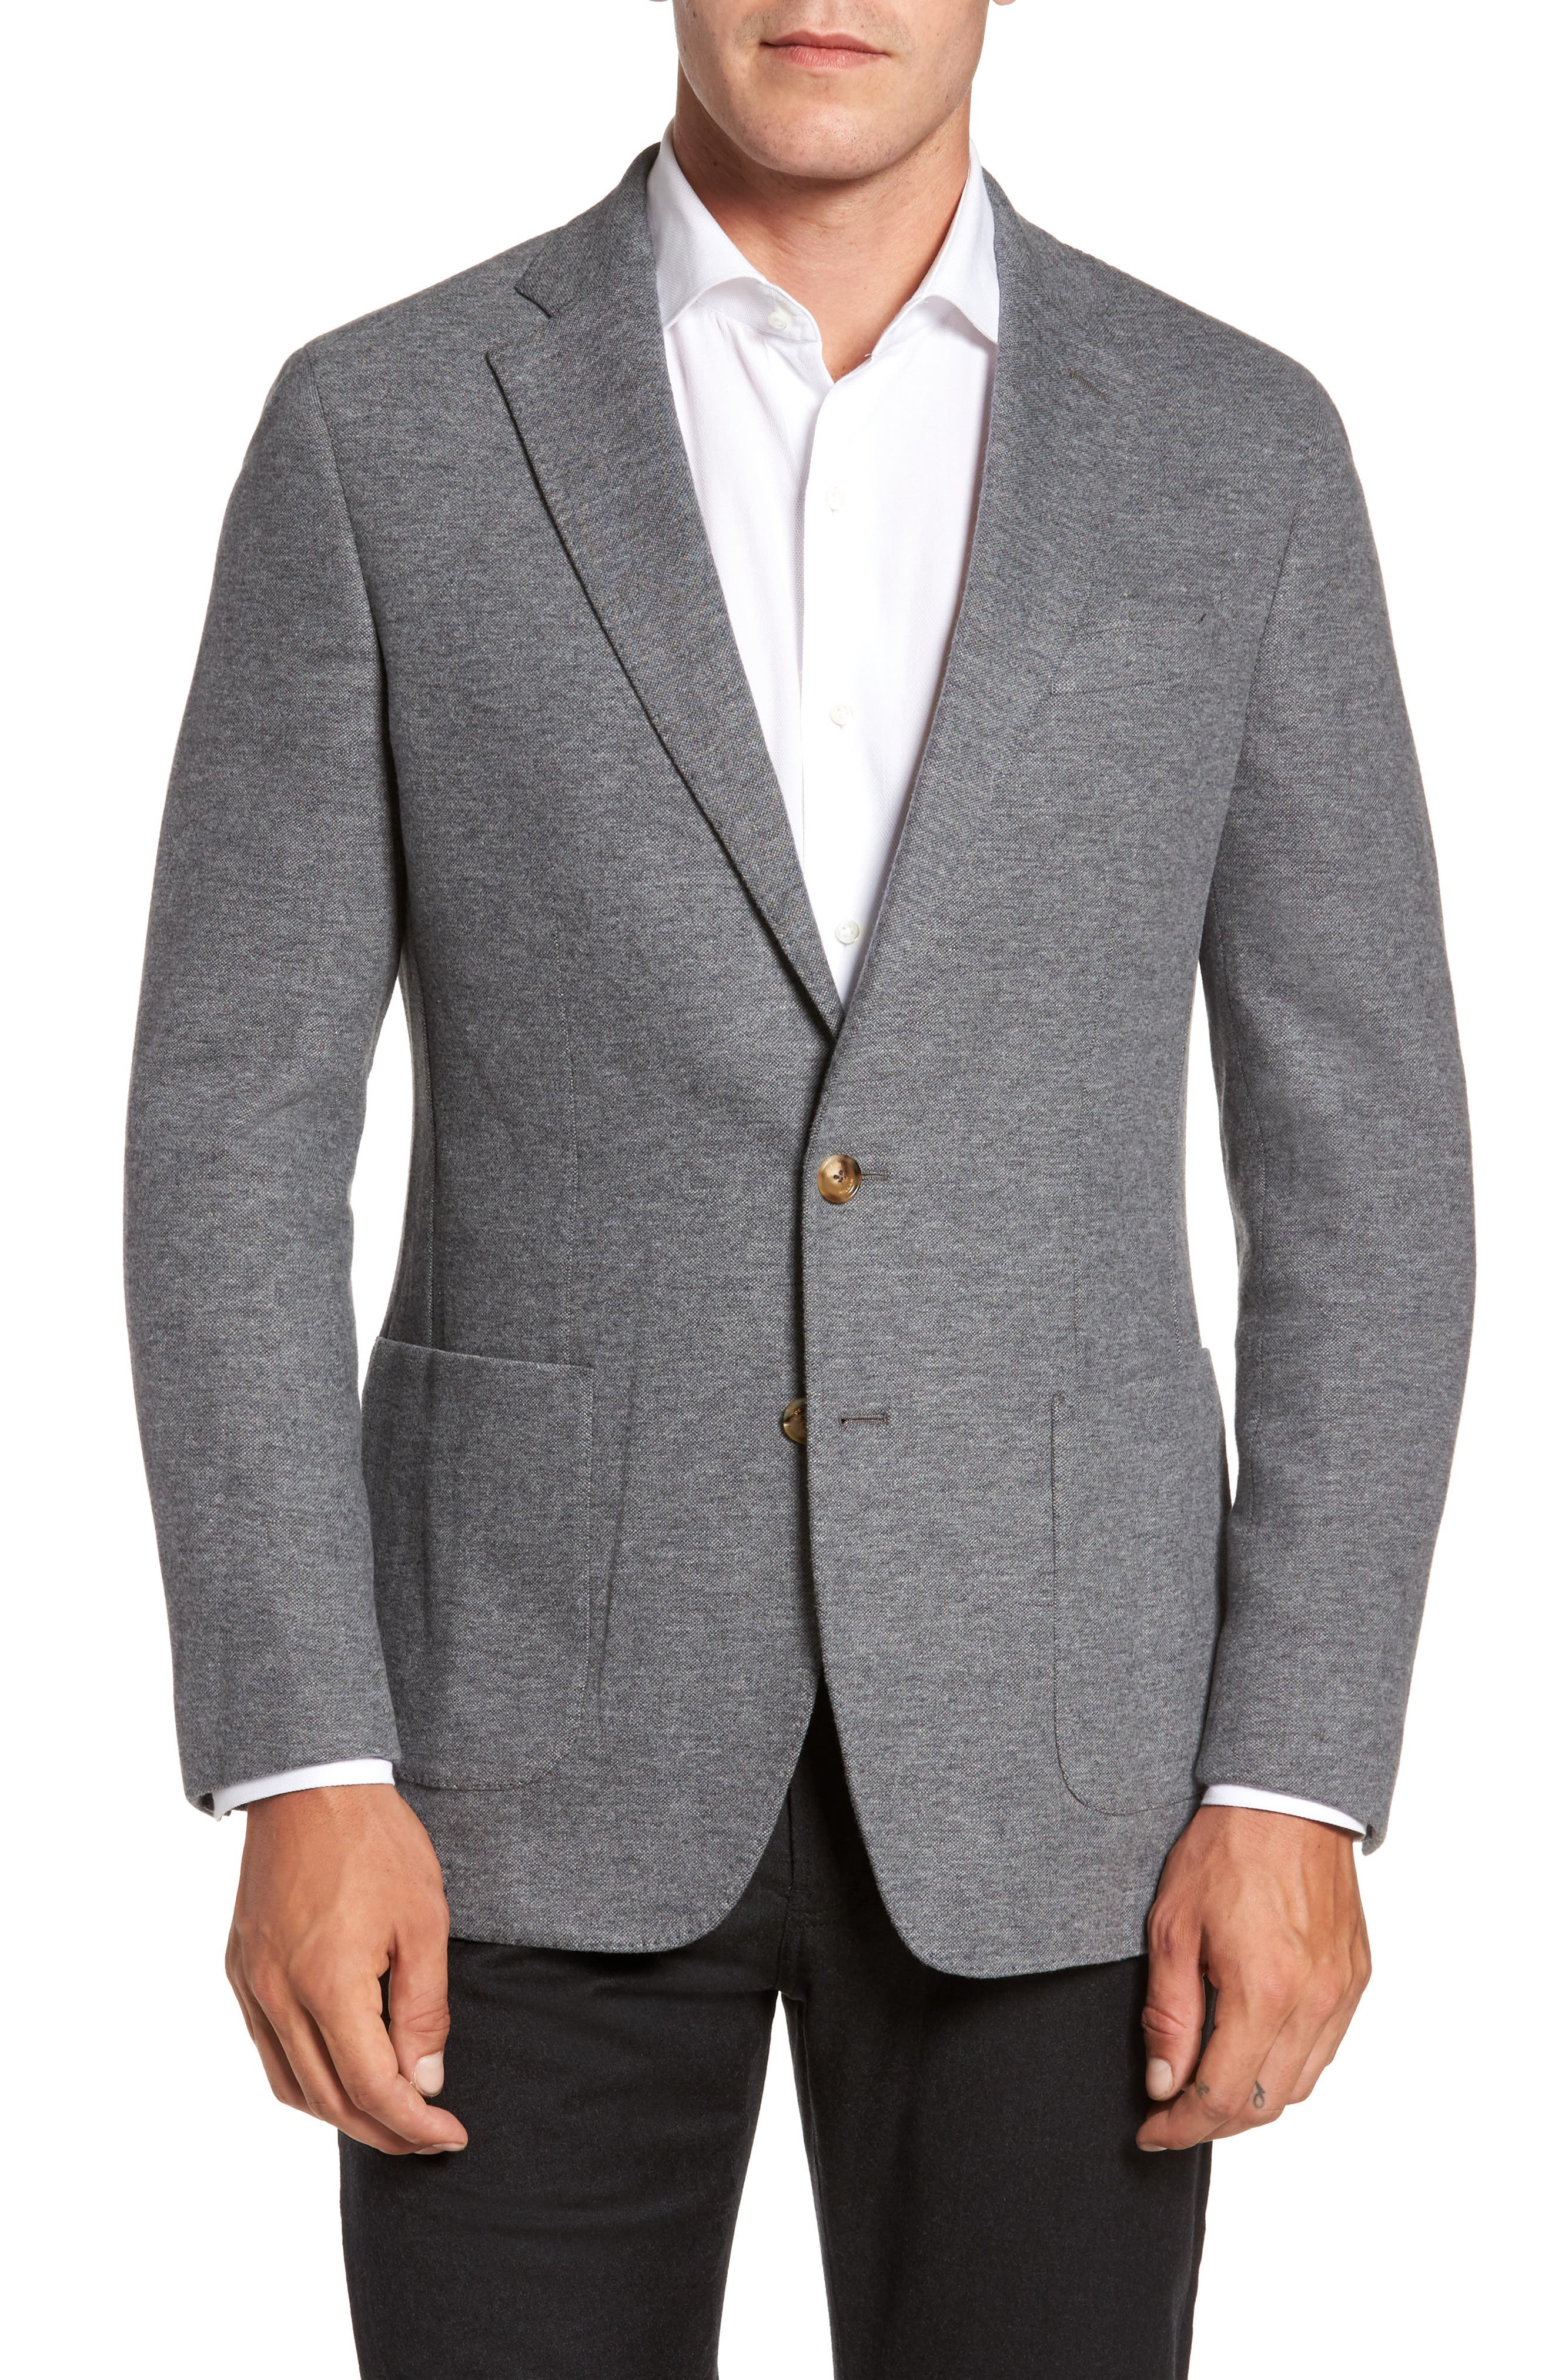 Main Image - Peter Millar Sierran Jersey Knit Jacket